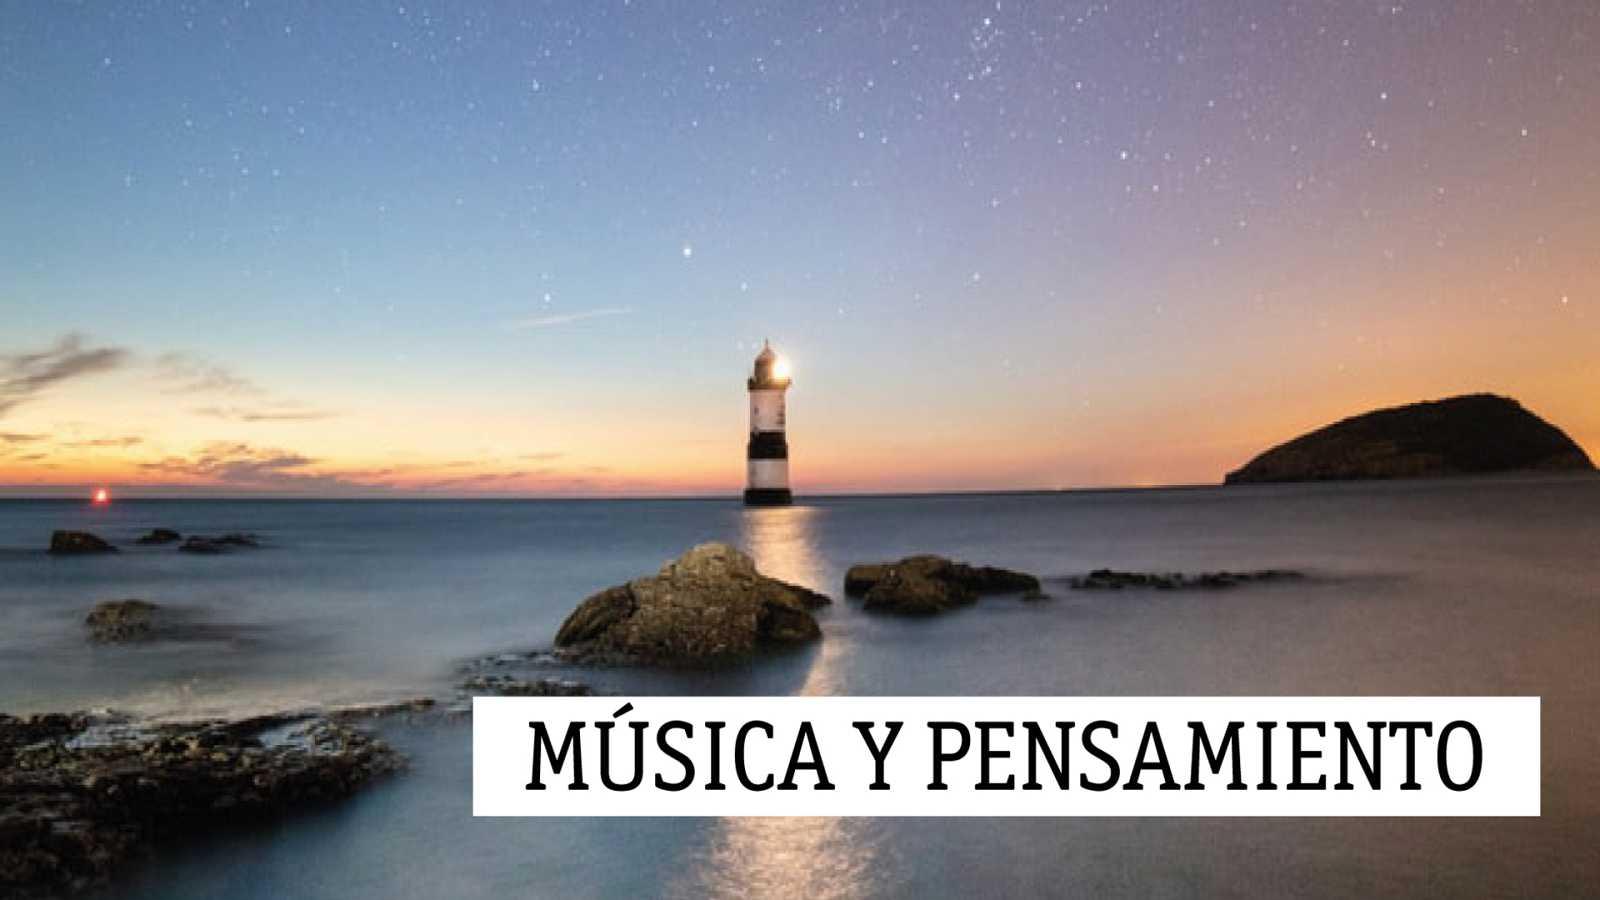 Música y pensamiento - Jean-Yves Jouannais - 18/10/20 - escuchar ahora